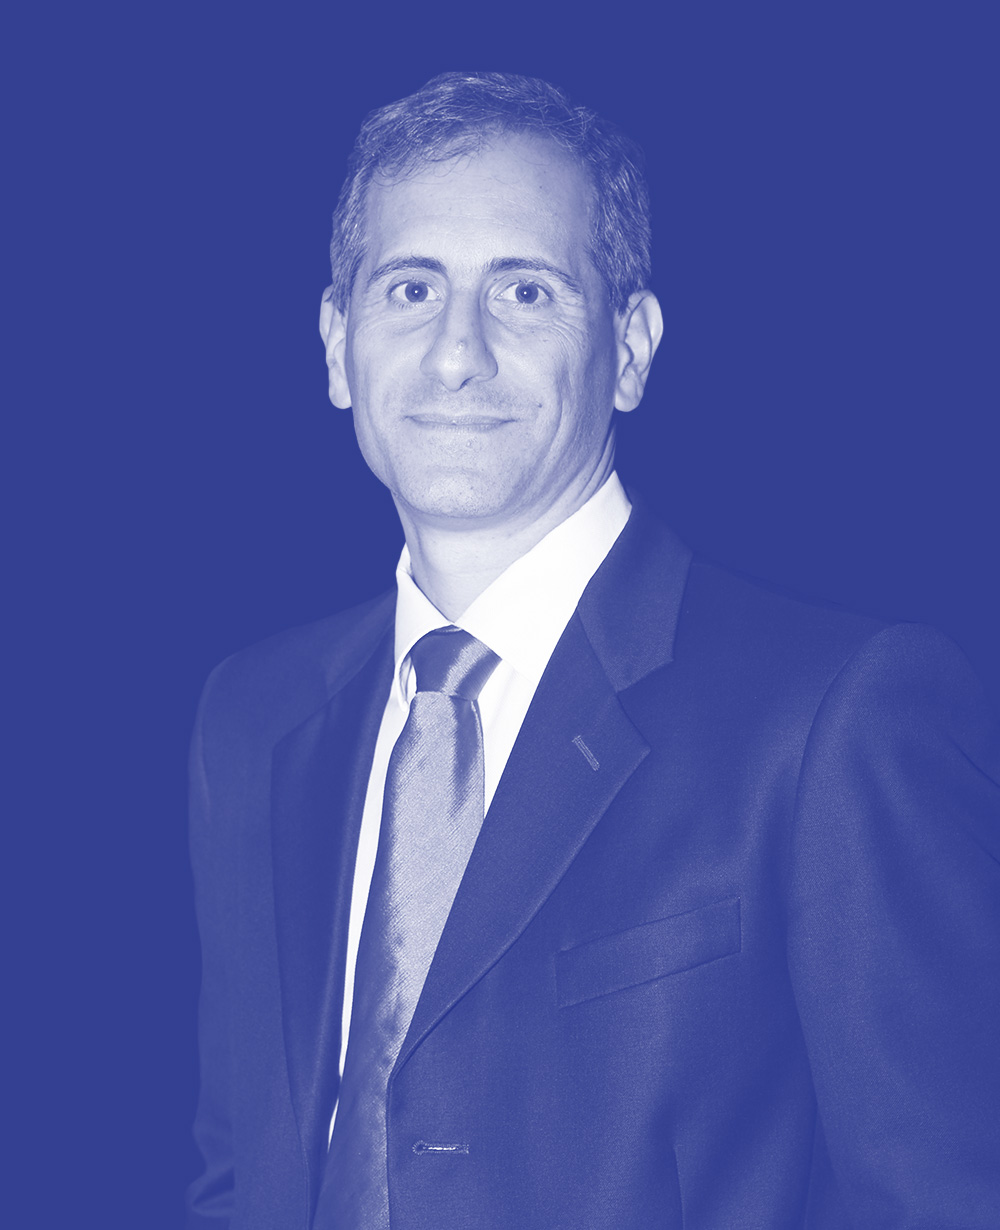 Antonio Antonuccio –Almas Consulting Founder and Executive Director (Advisory, Consulting and Interim Management services)